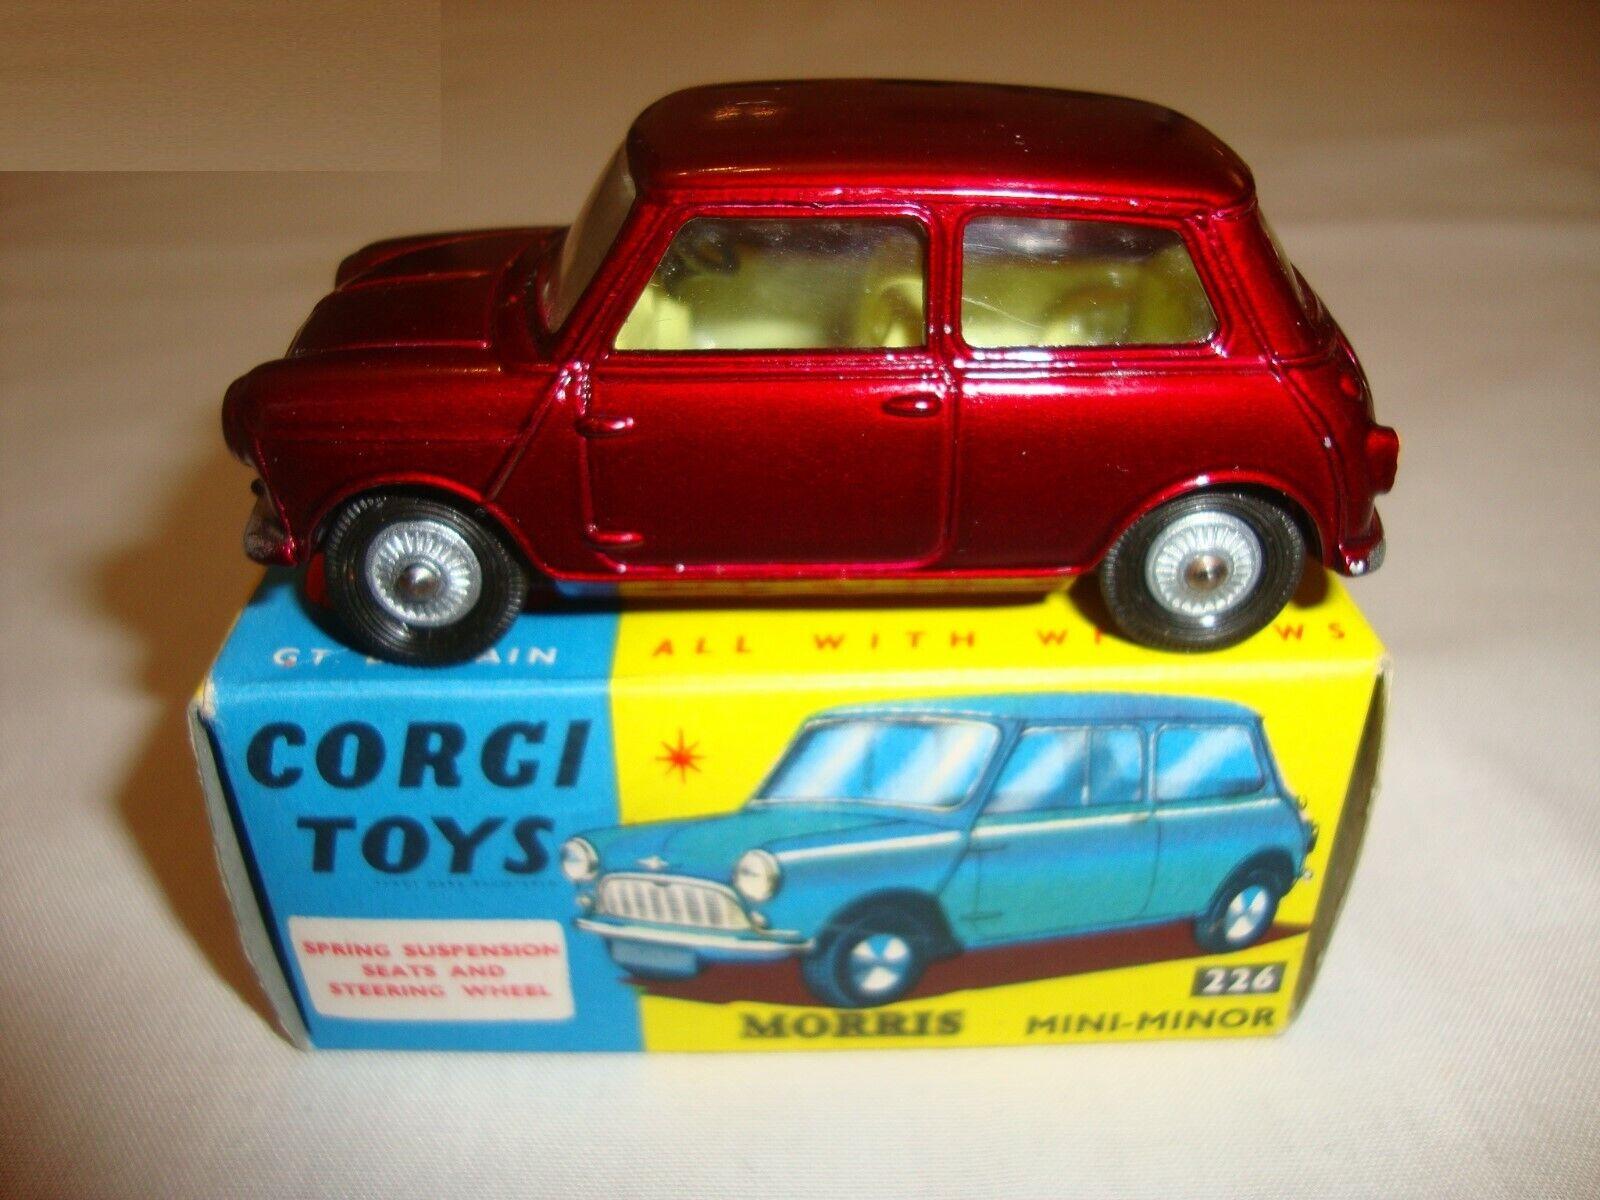 Corgi 226 morris mini minor-excellent dans boîte d'origine